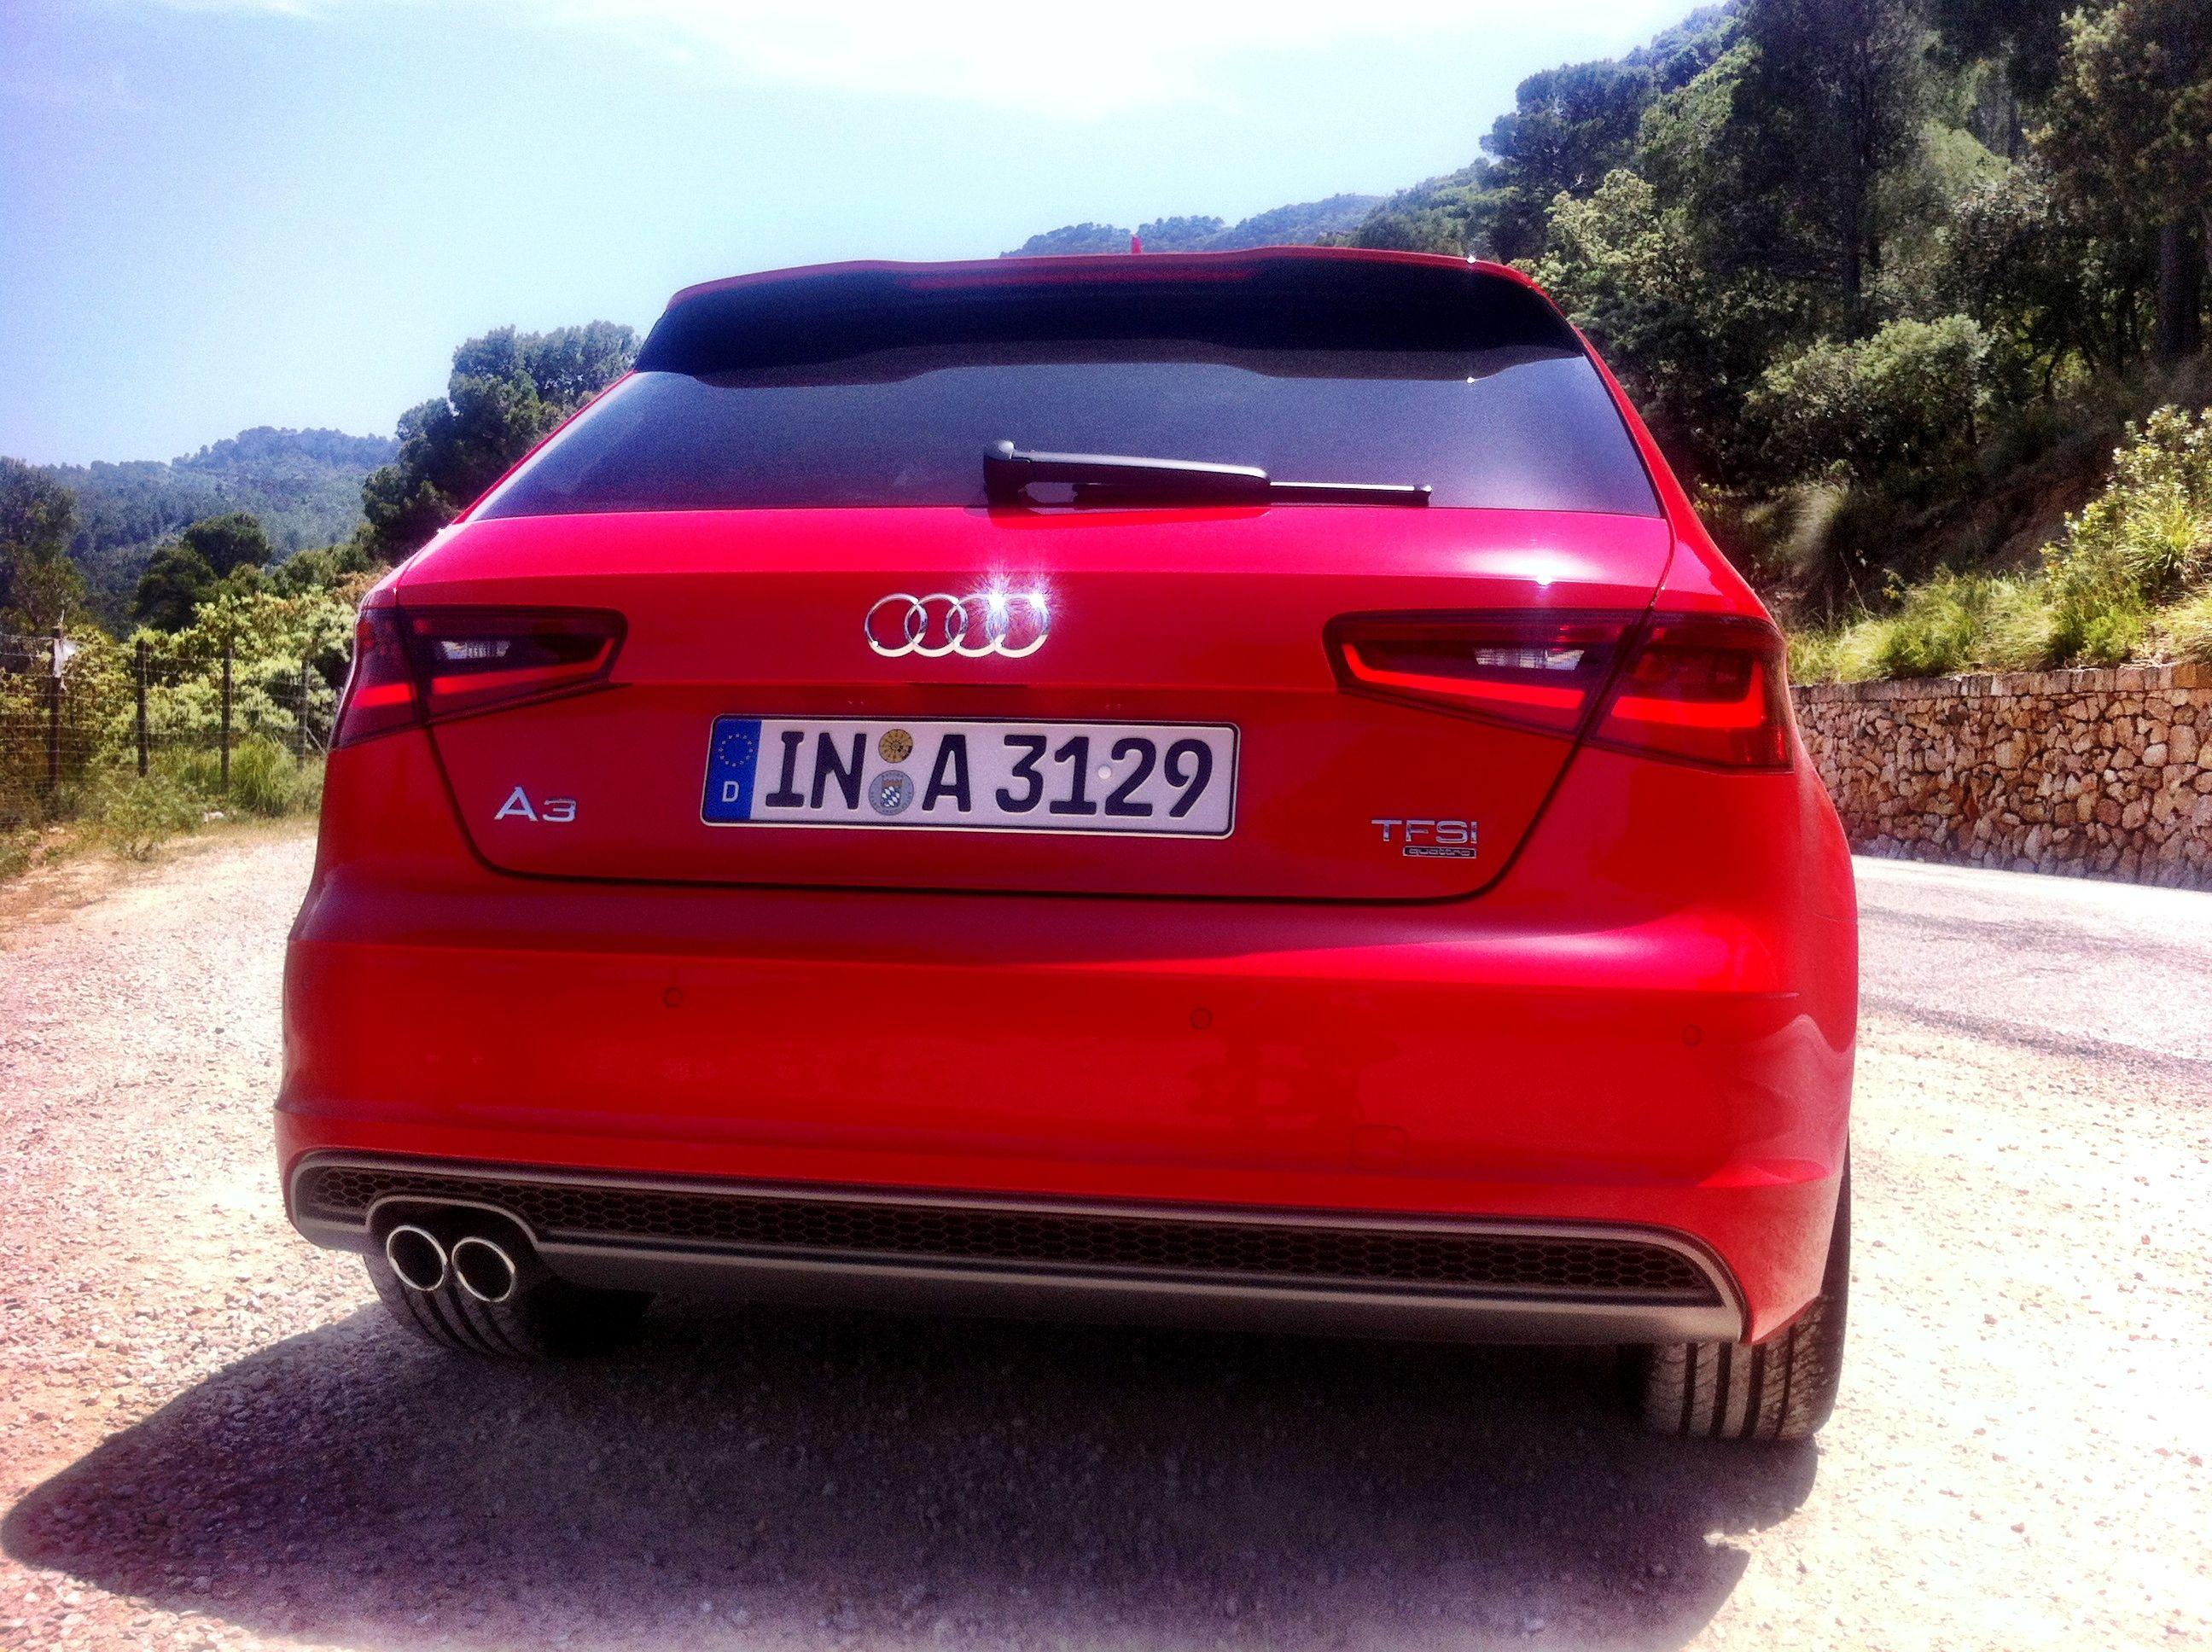 The new #Audi #A3  1,8 TFSI Quattro